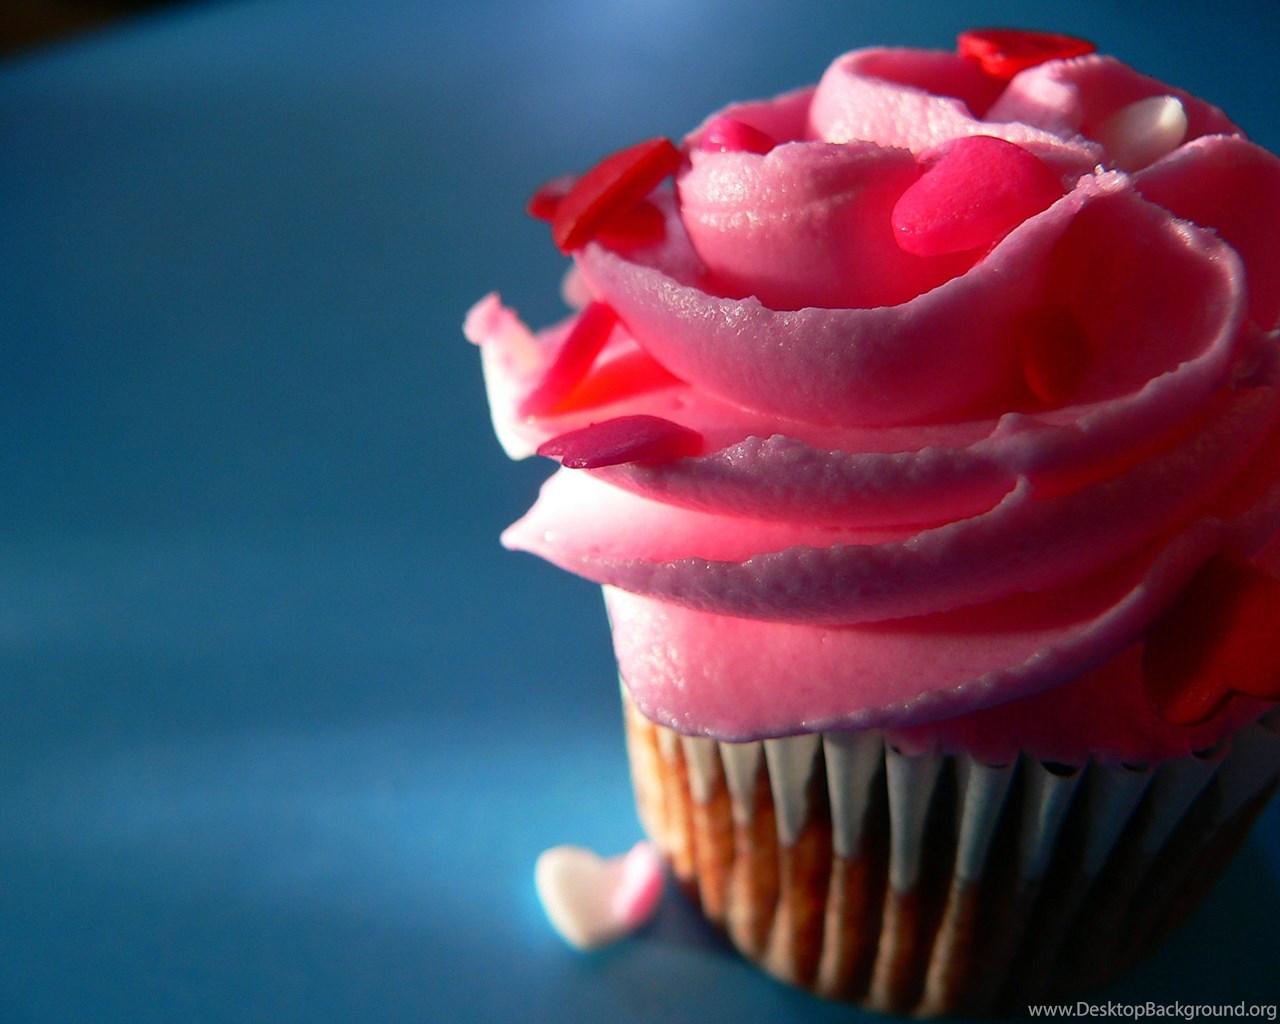 20 Cupcake Wallpapers And Desktop Backgrounds Desktop Background